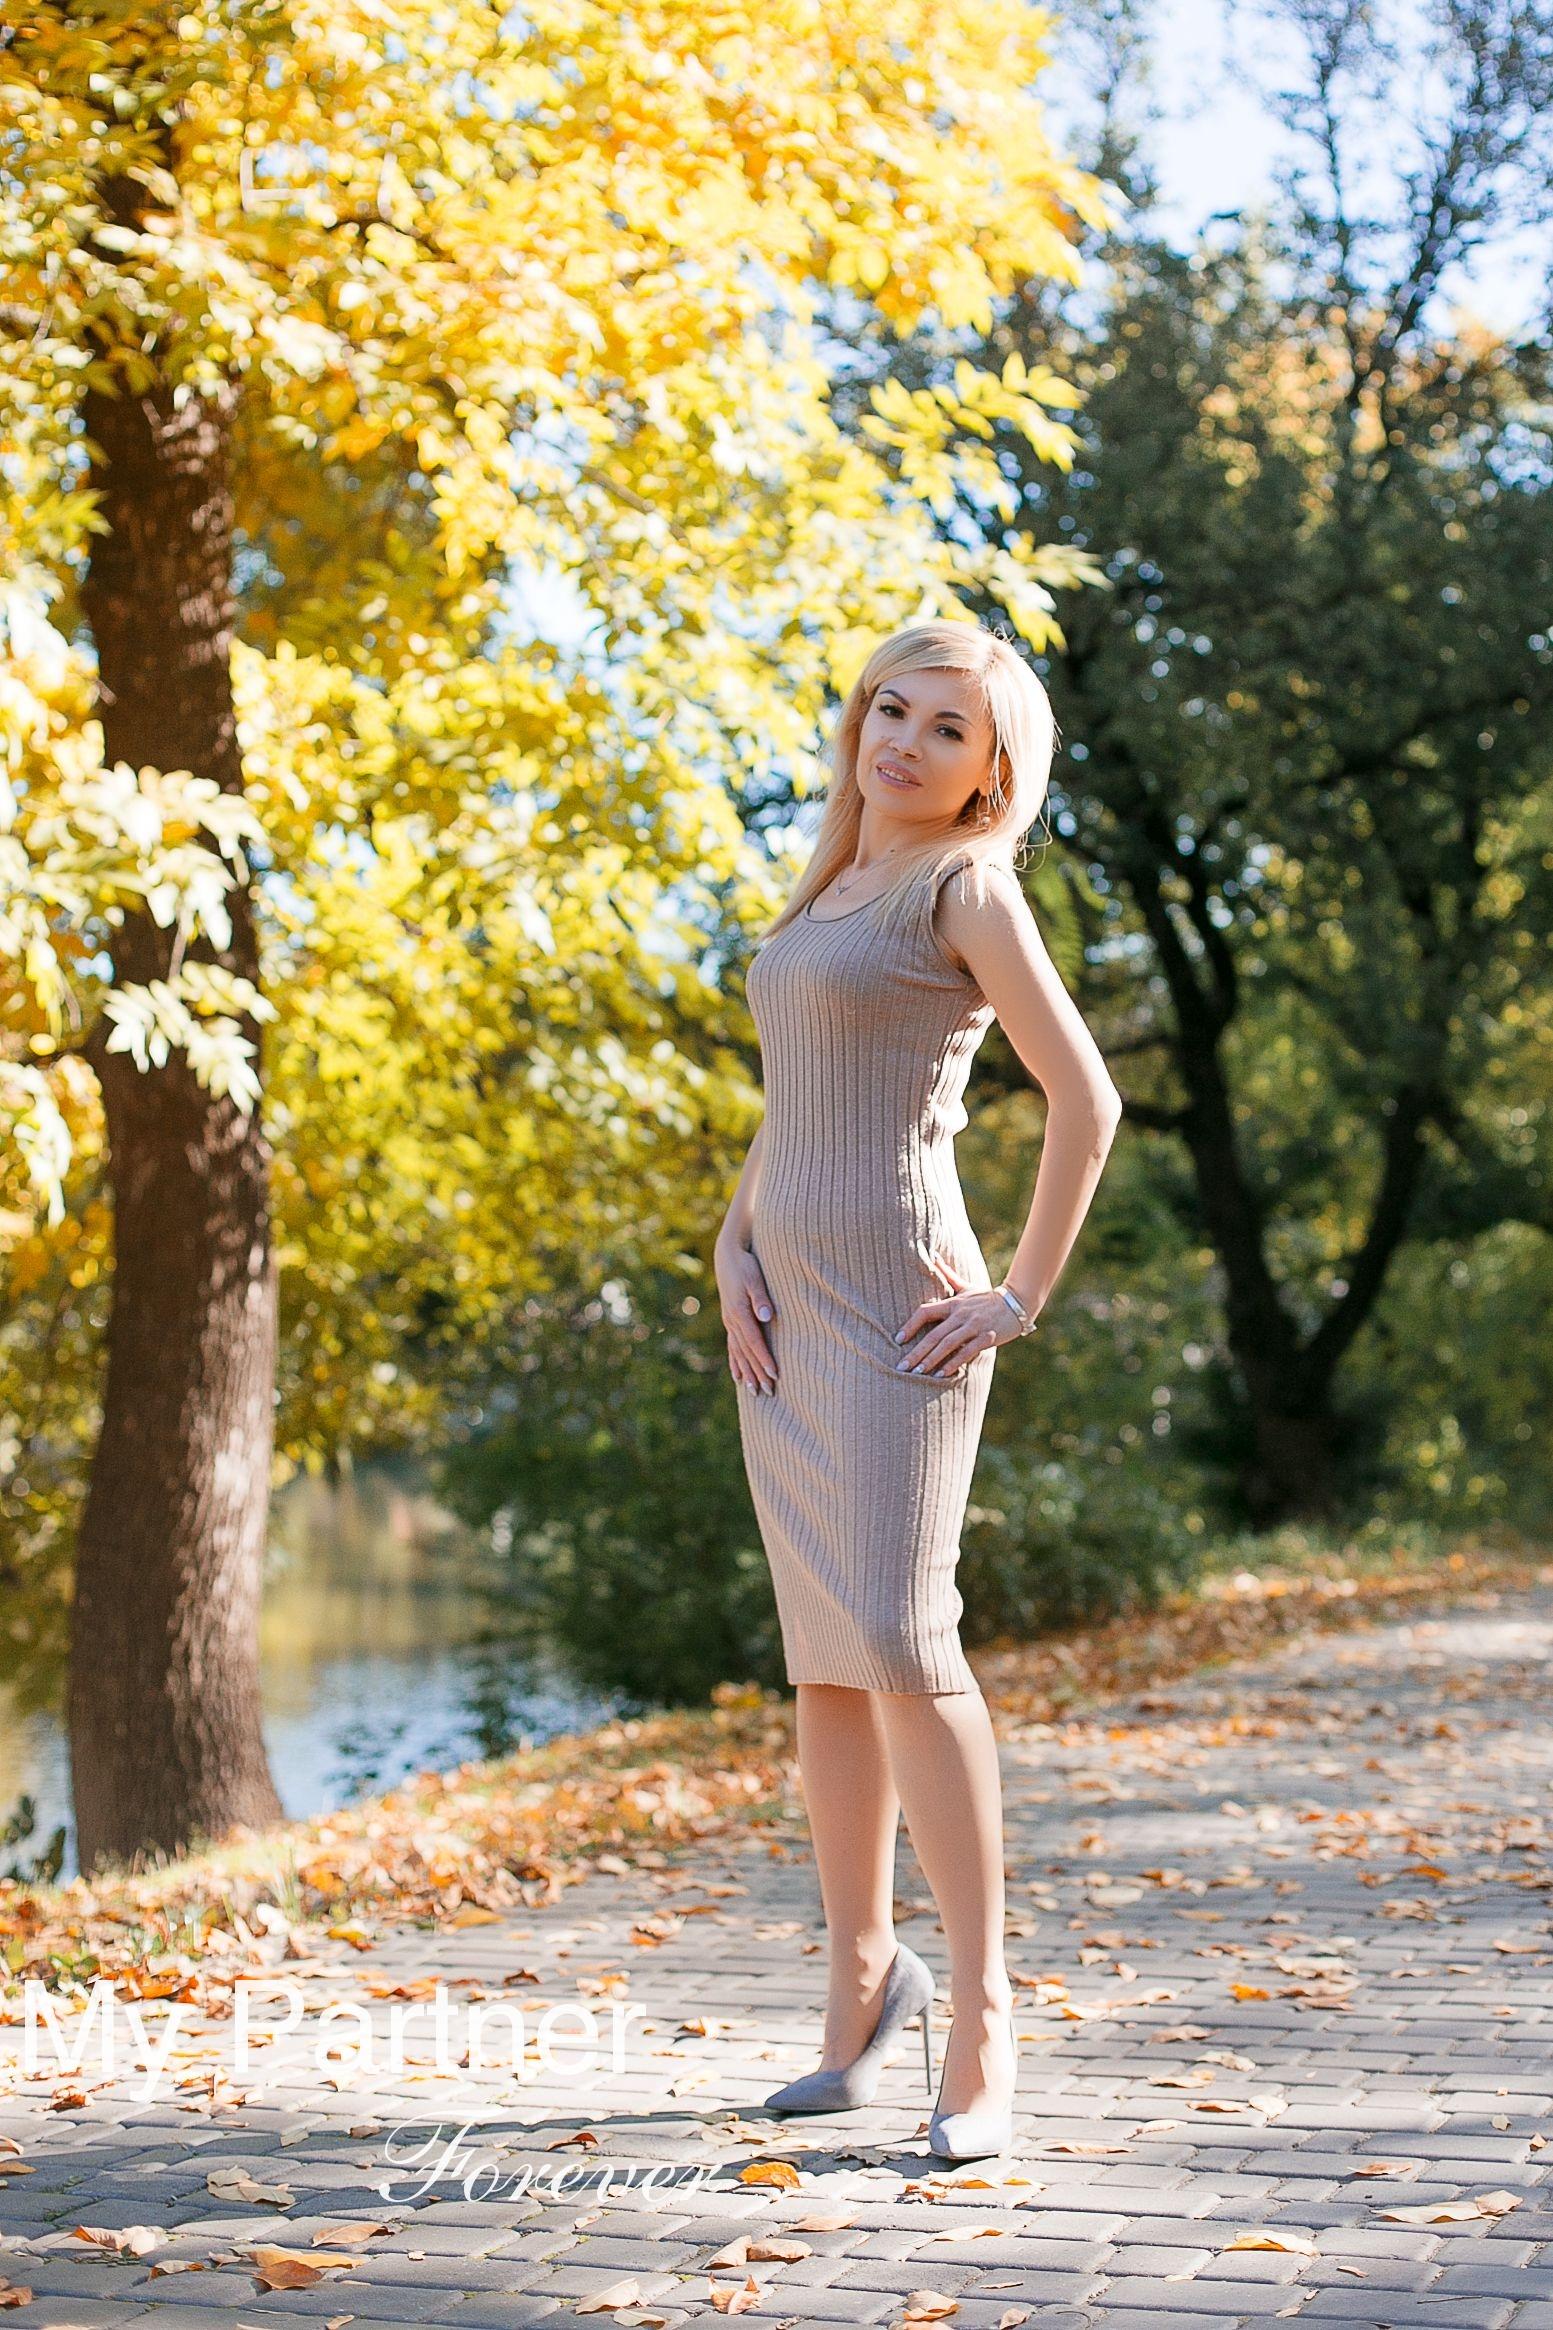 Online dating ukraine login in Australia